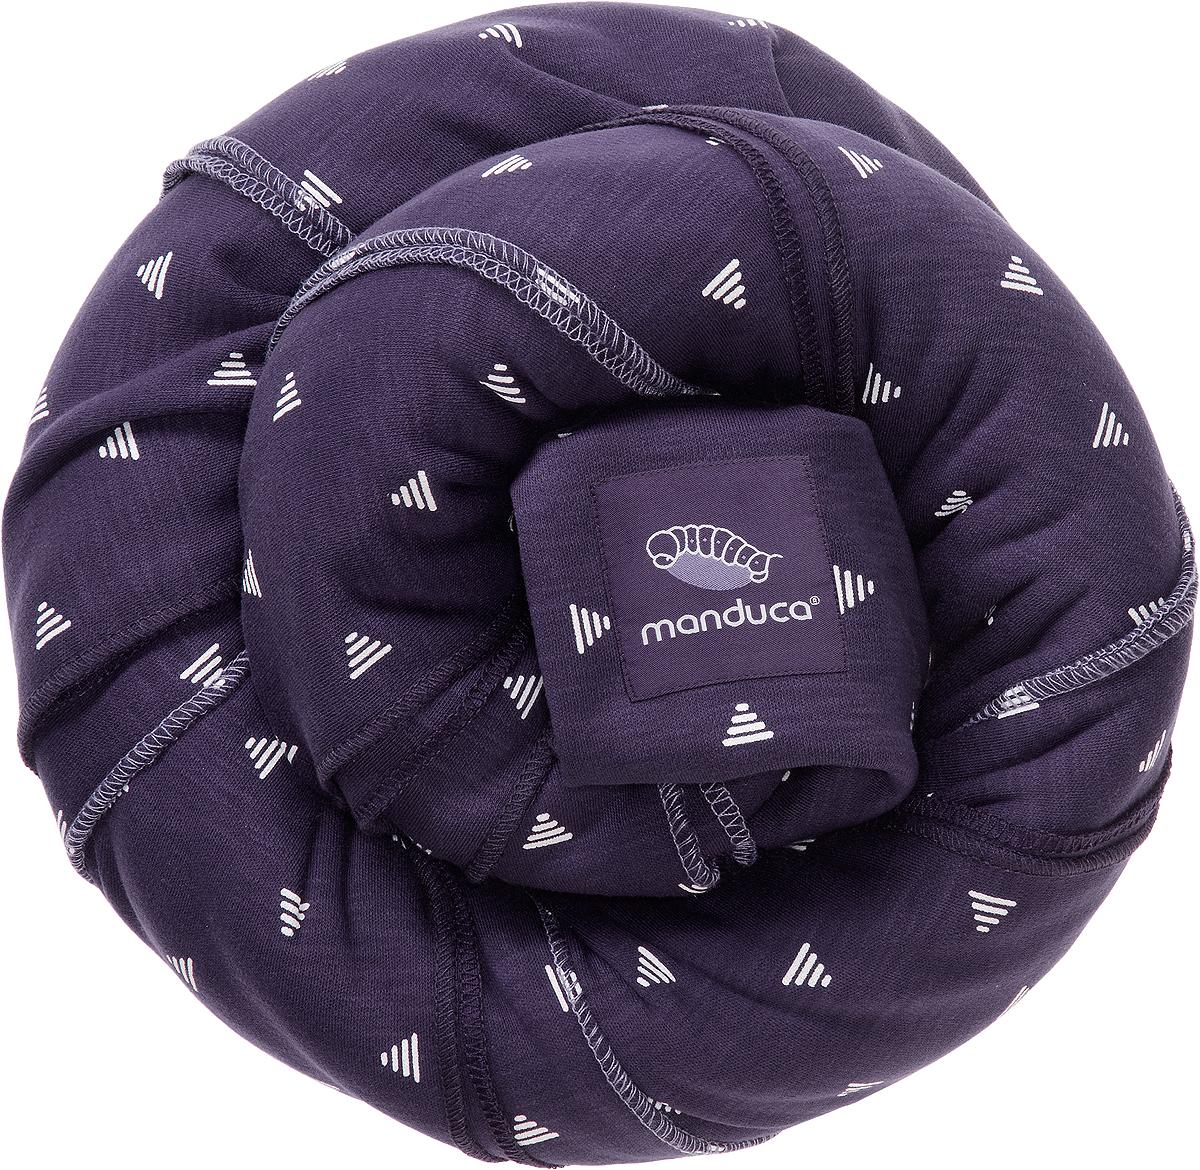 Manduca Слинг-шарф LimitedEdition - Рюкзаки, слинги, кенгуру